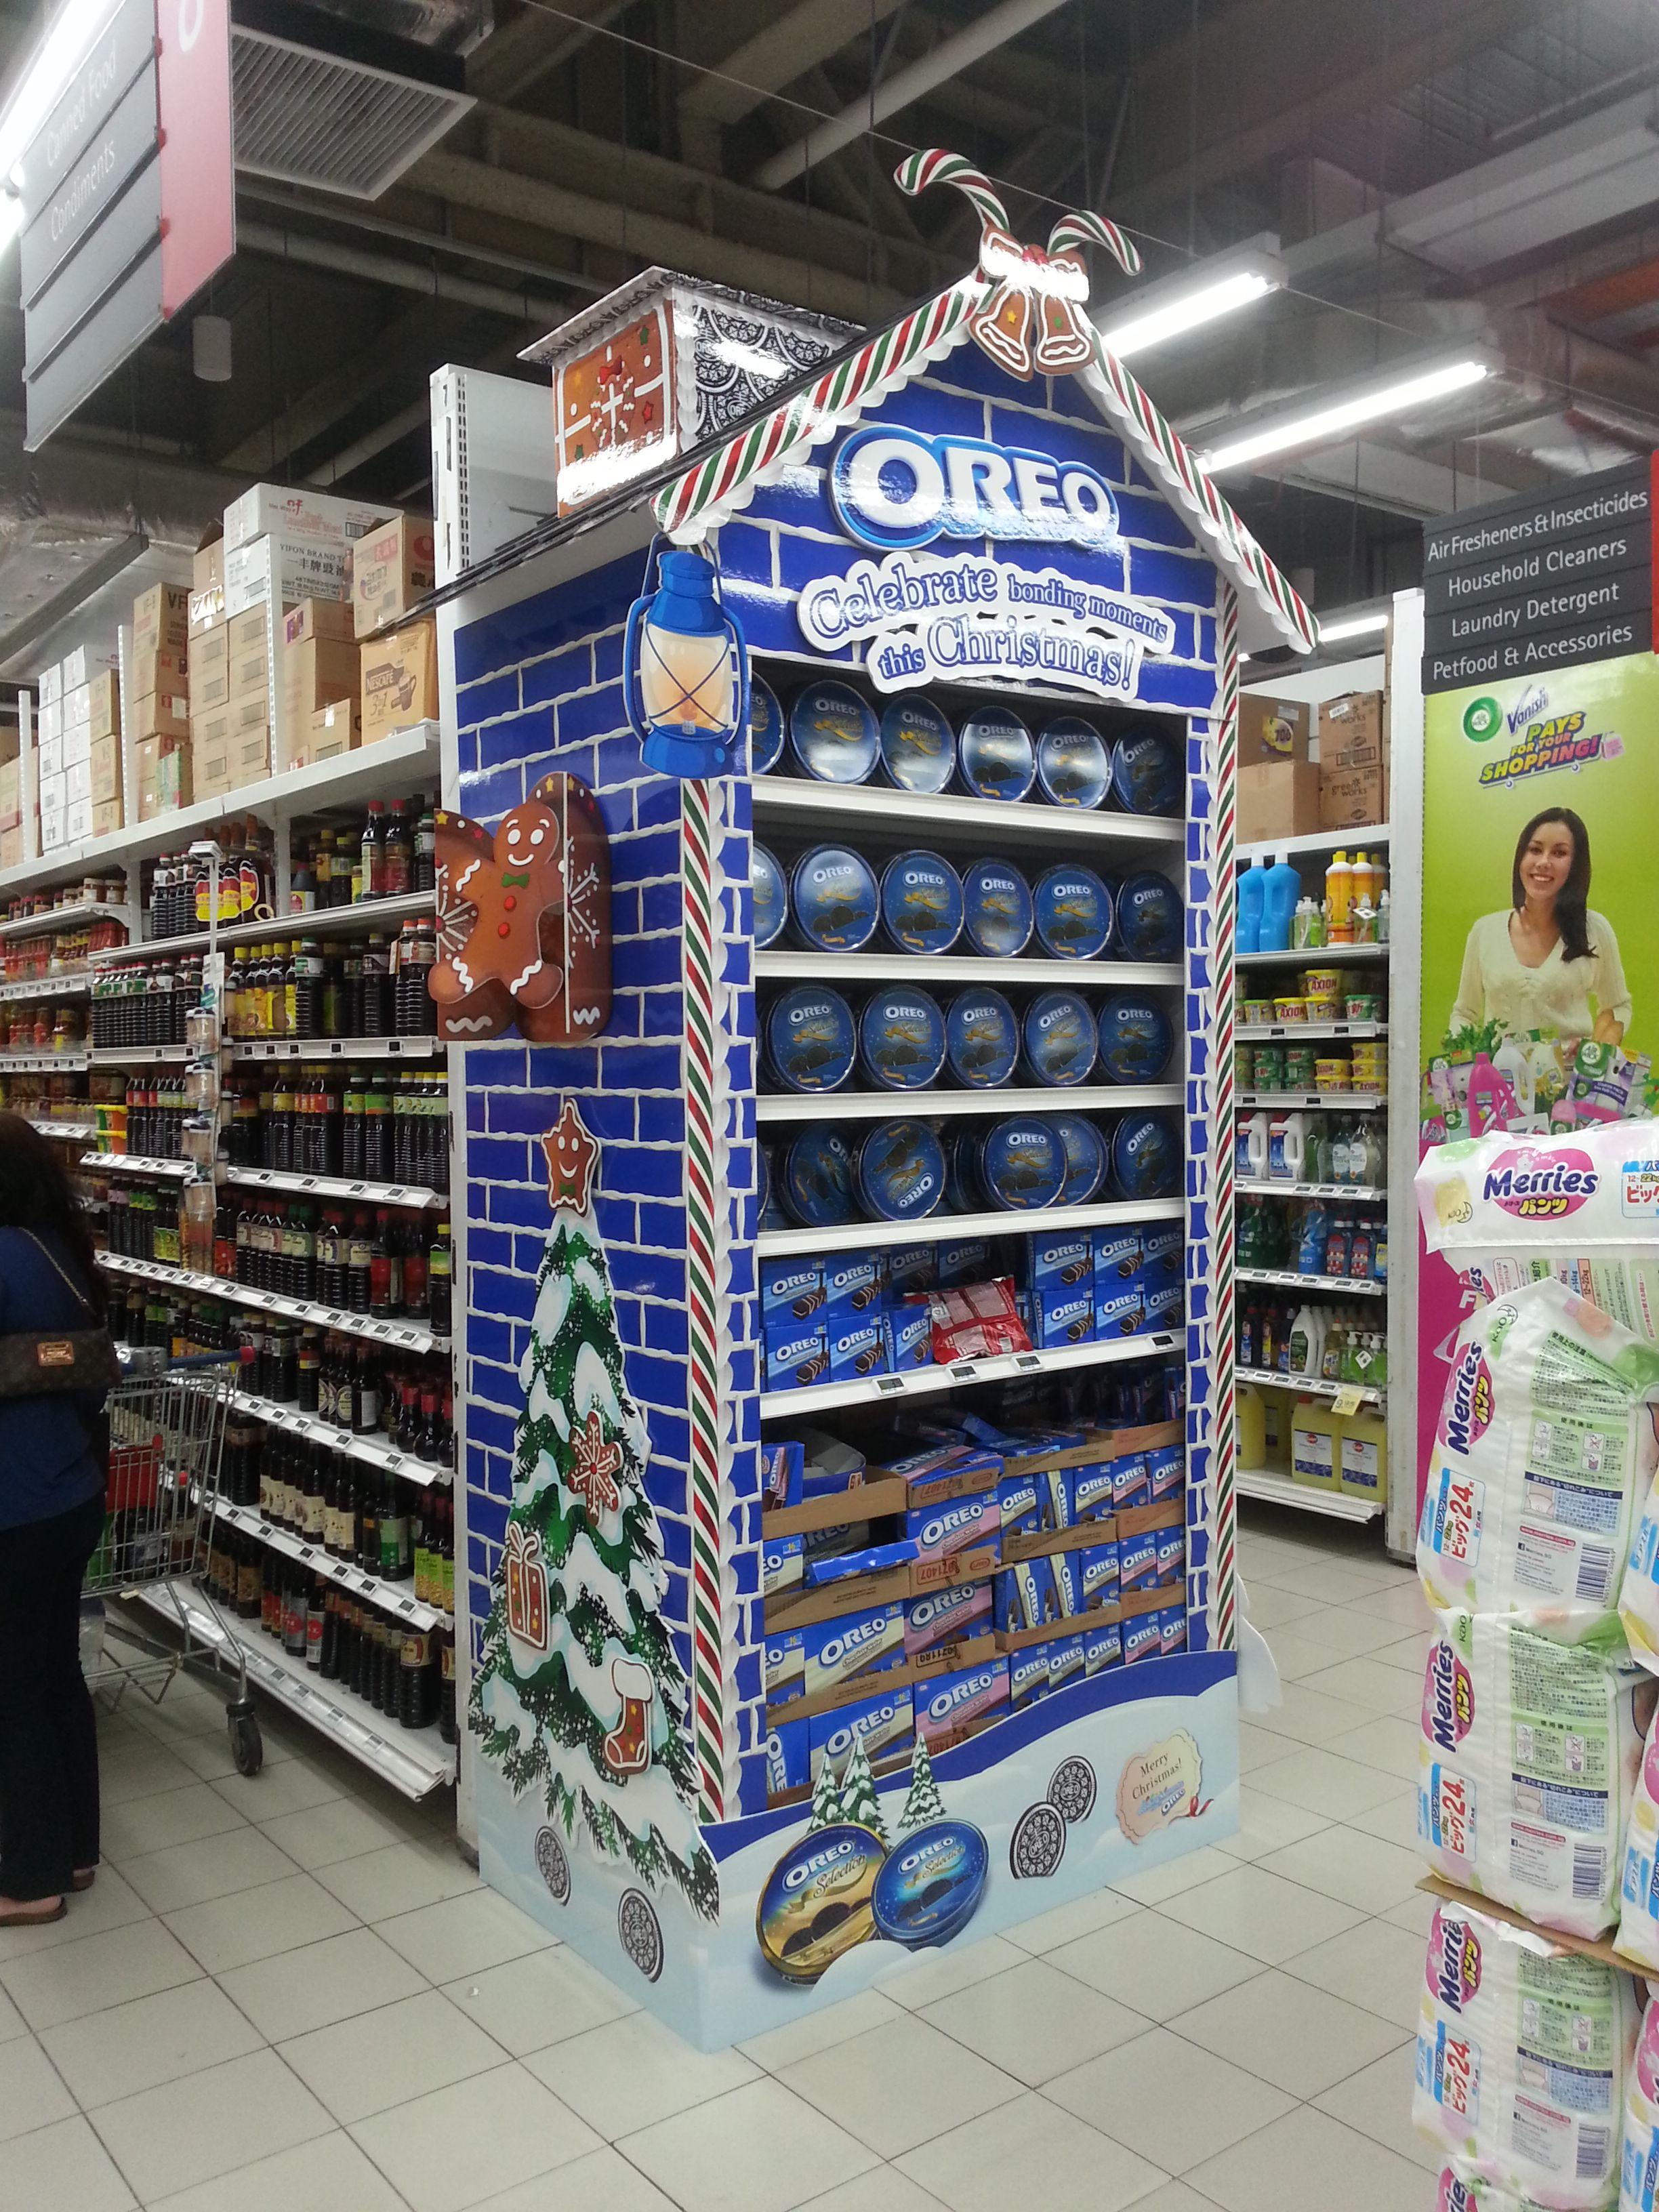 Posm design sofy posm design - Supermarket Design Promotional Ends Promo End Fixture Oreo